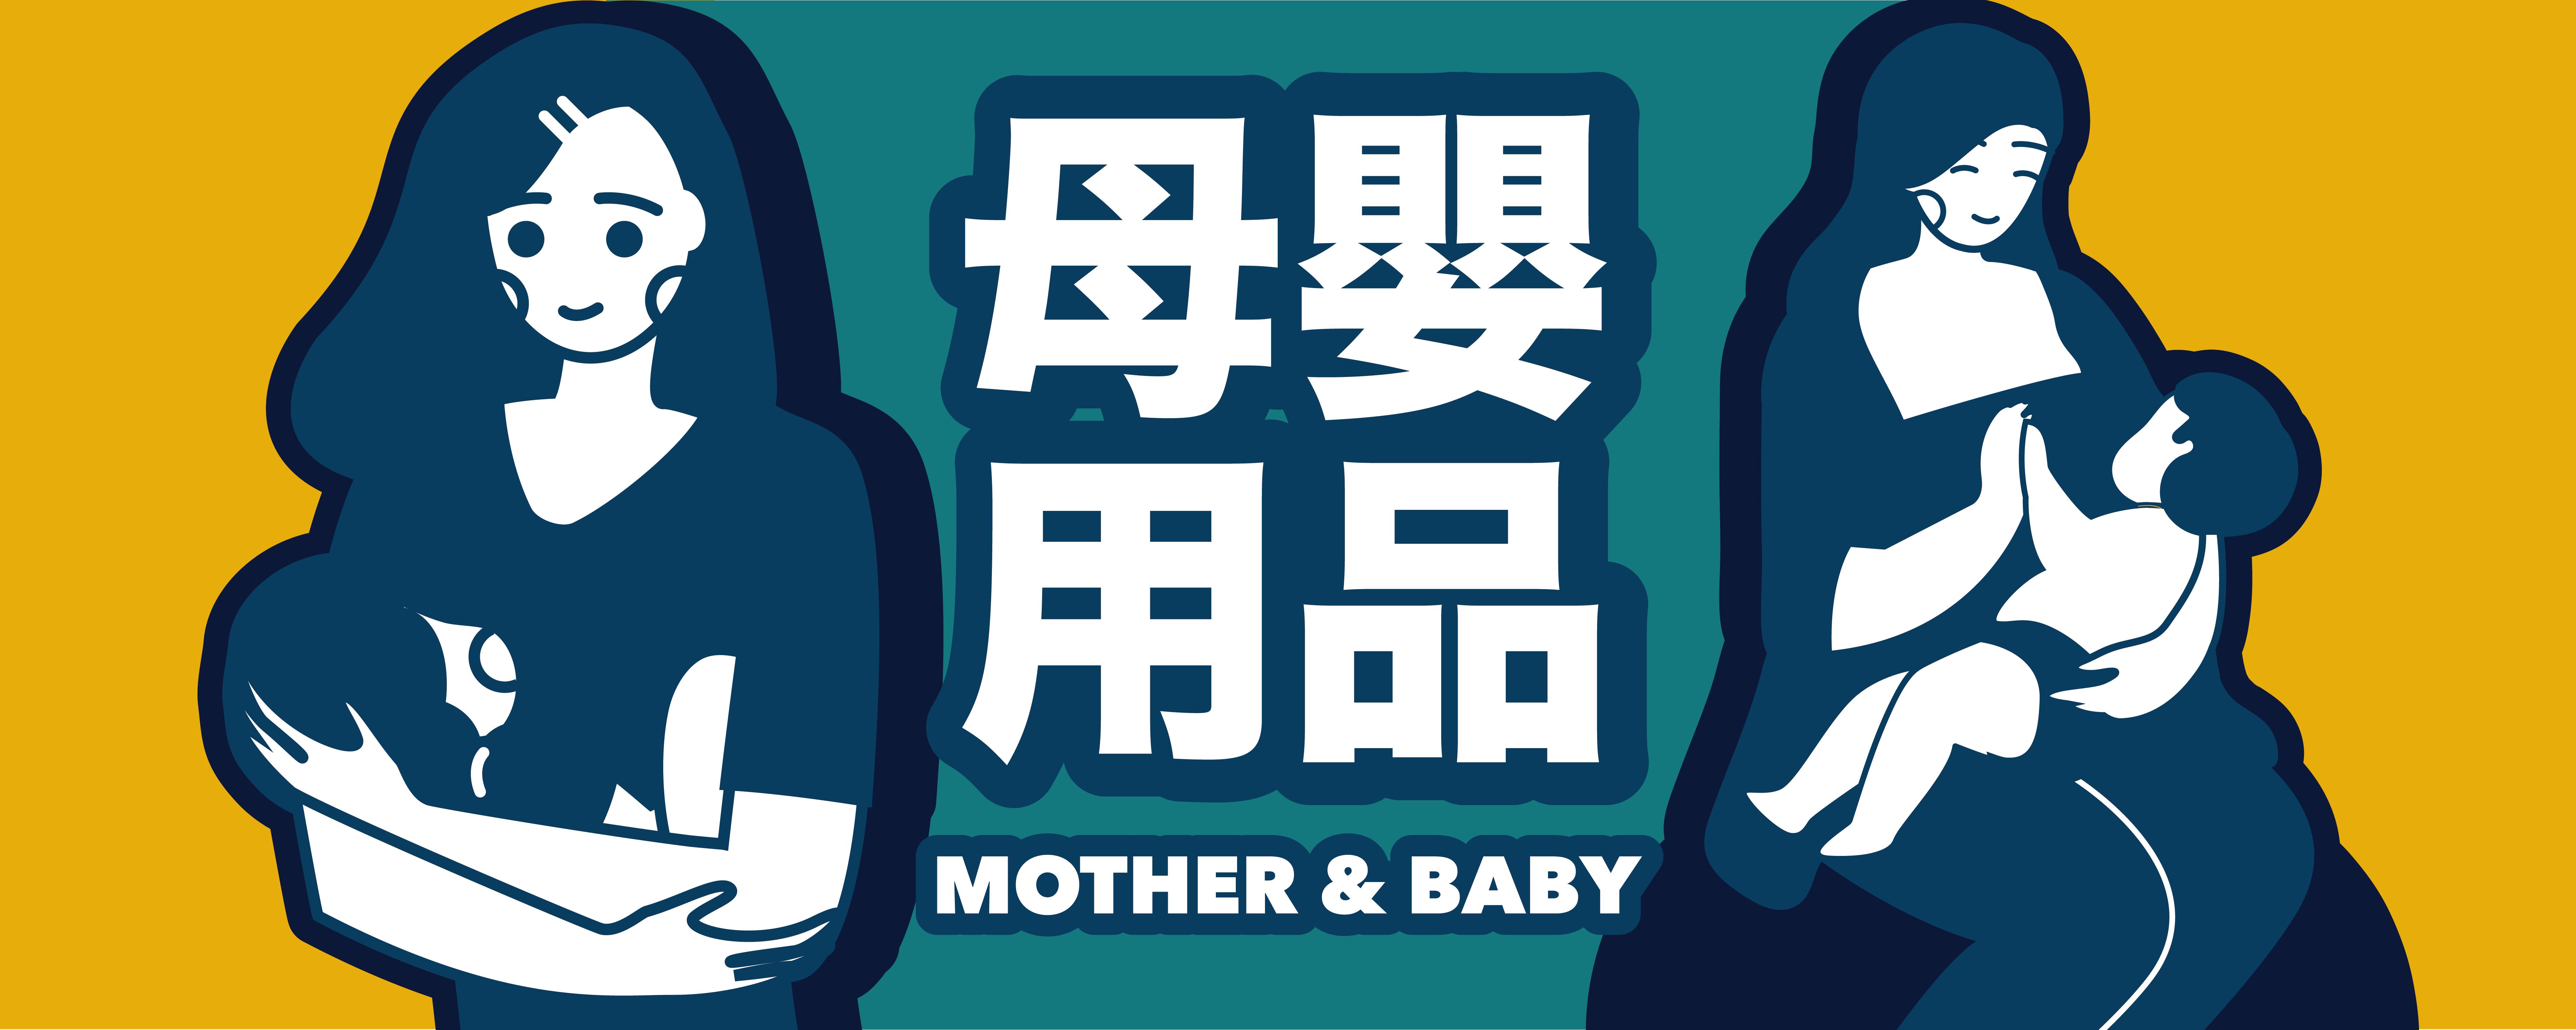 accstore 母嬰用品